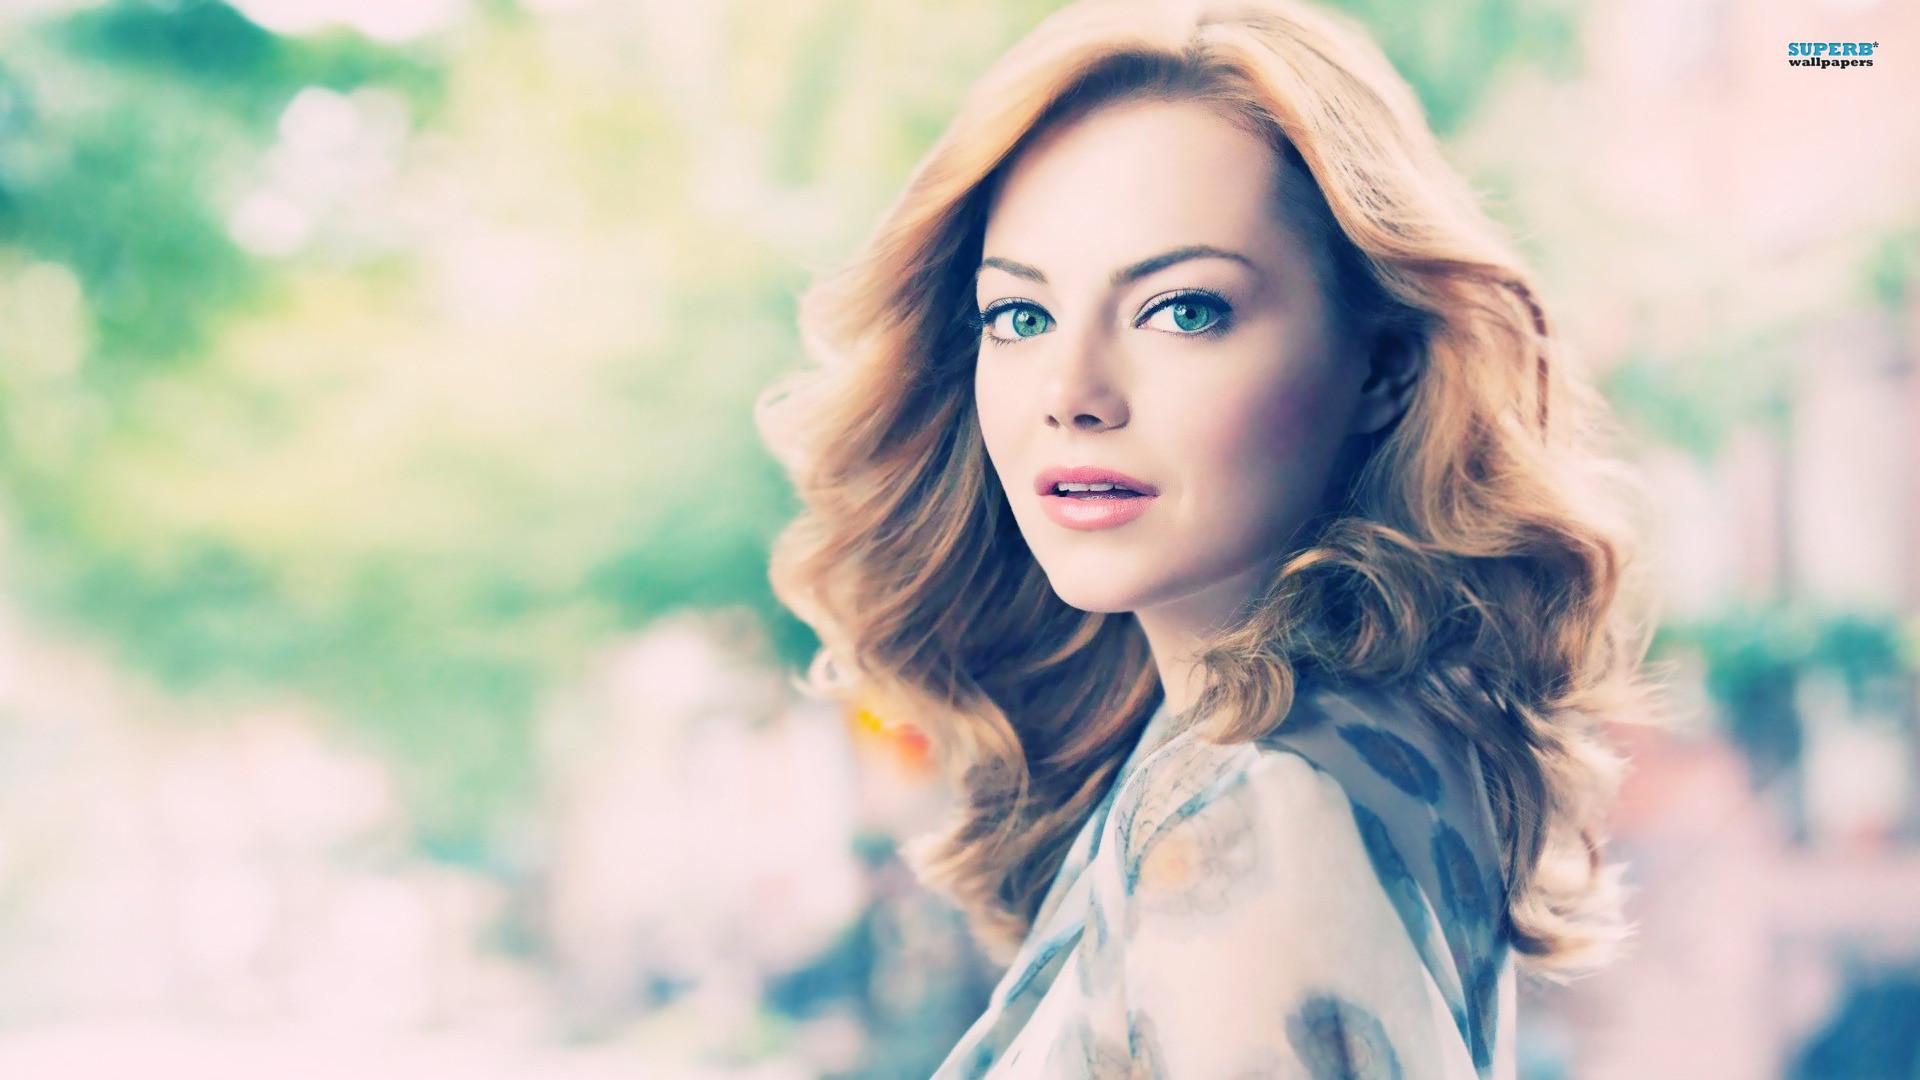 Emma Stone – HD Widescreen Backgrounds